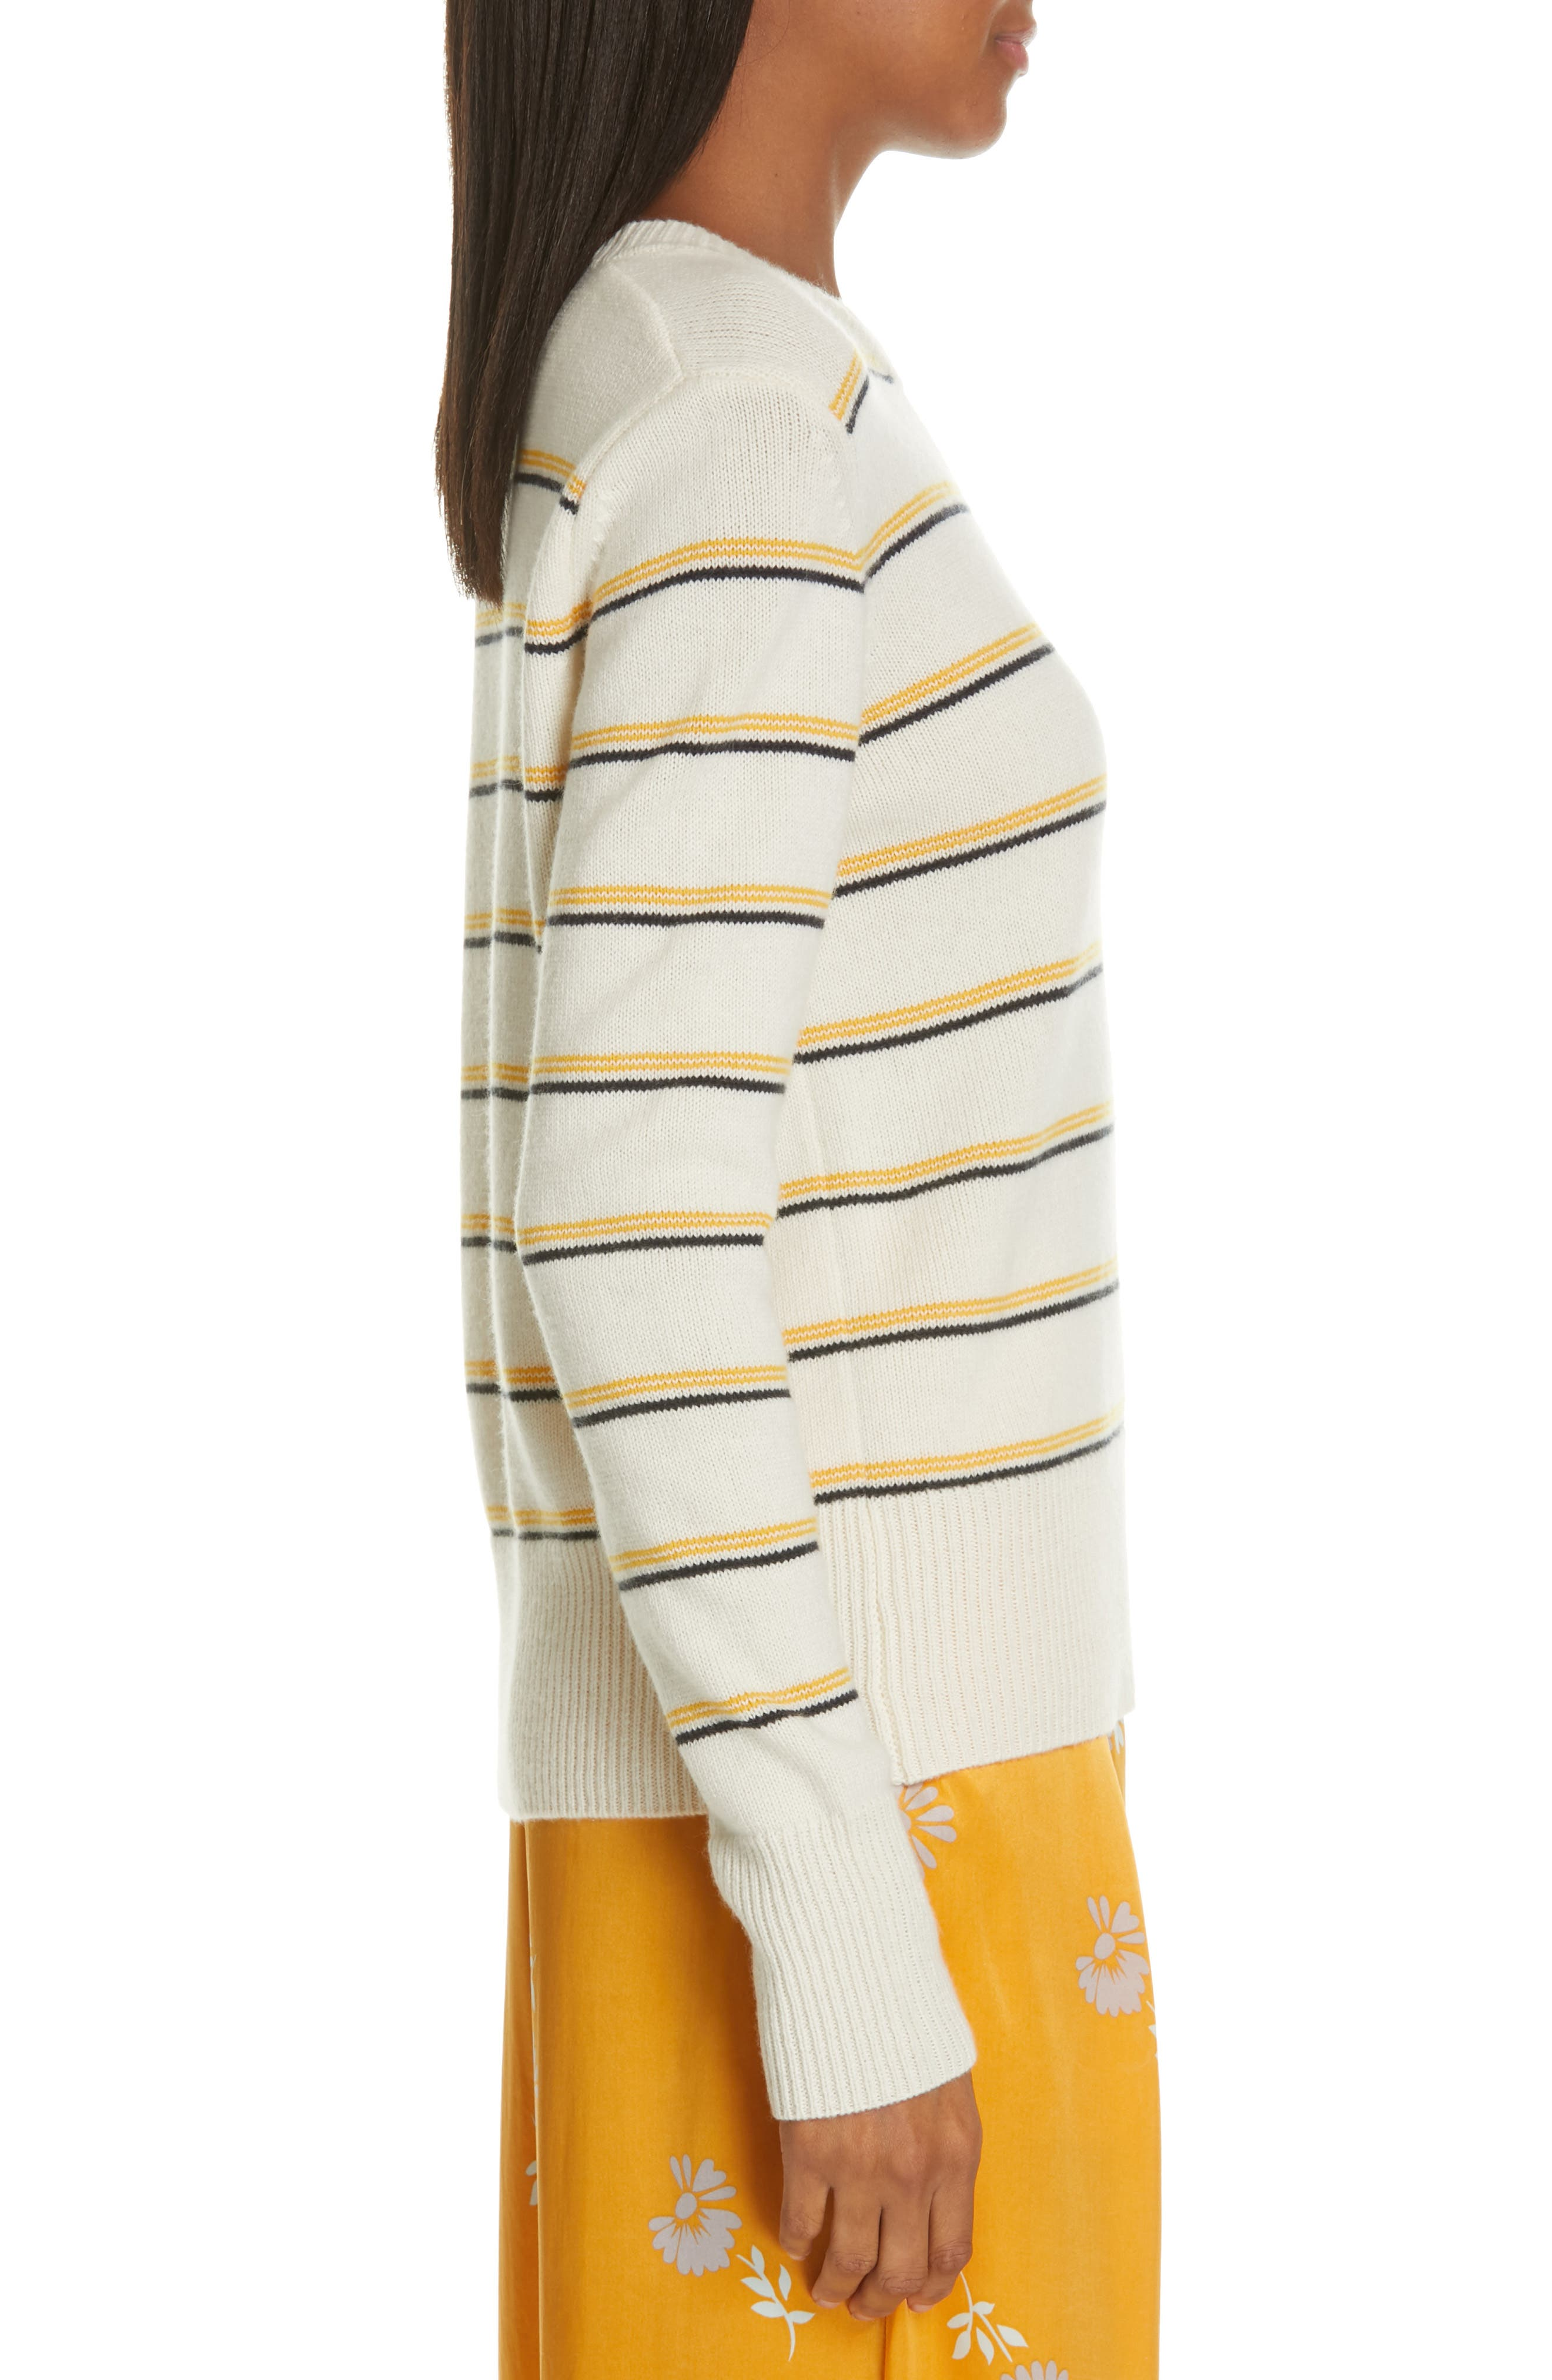 Duru Wool & Cashmere Sweater,                             Alternate thumbnail 3, color,                             NATURE WHITE MULTI